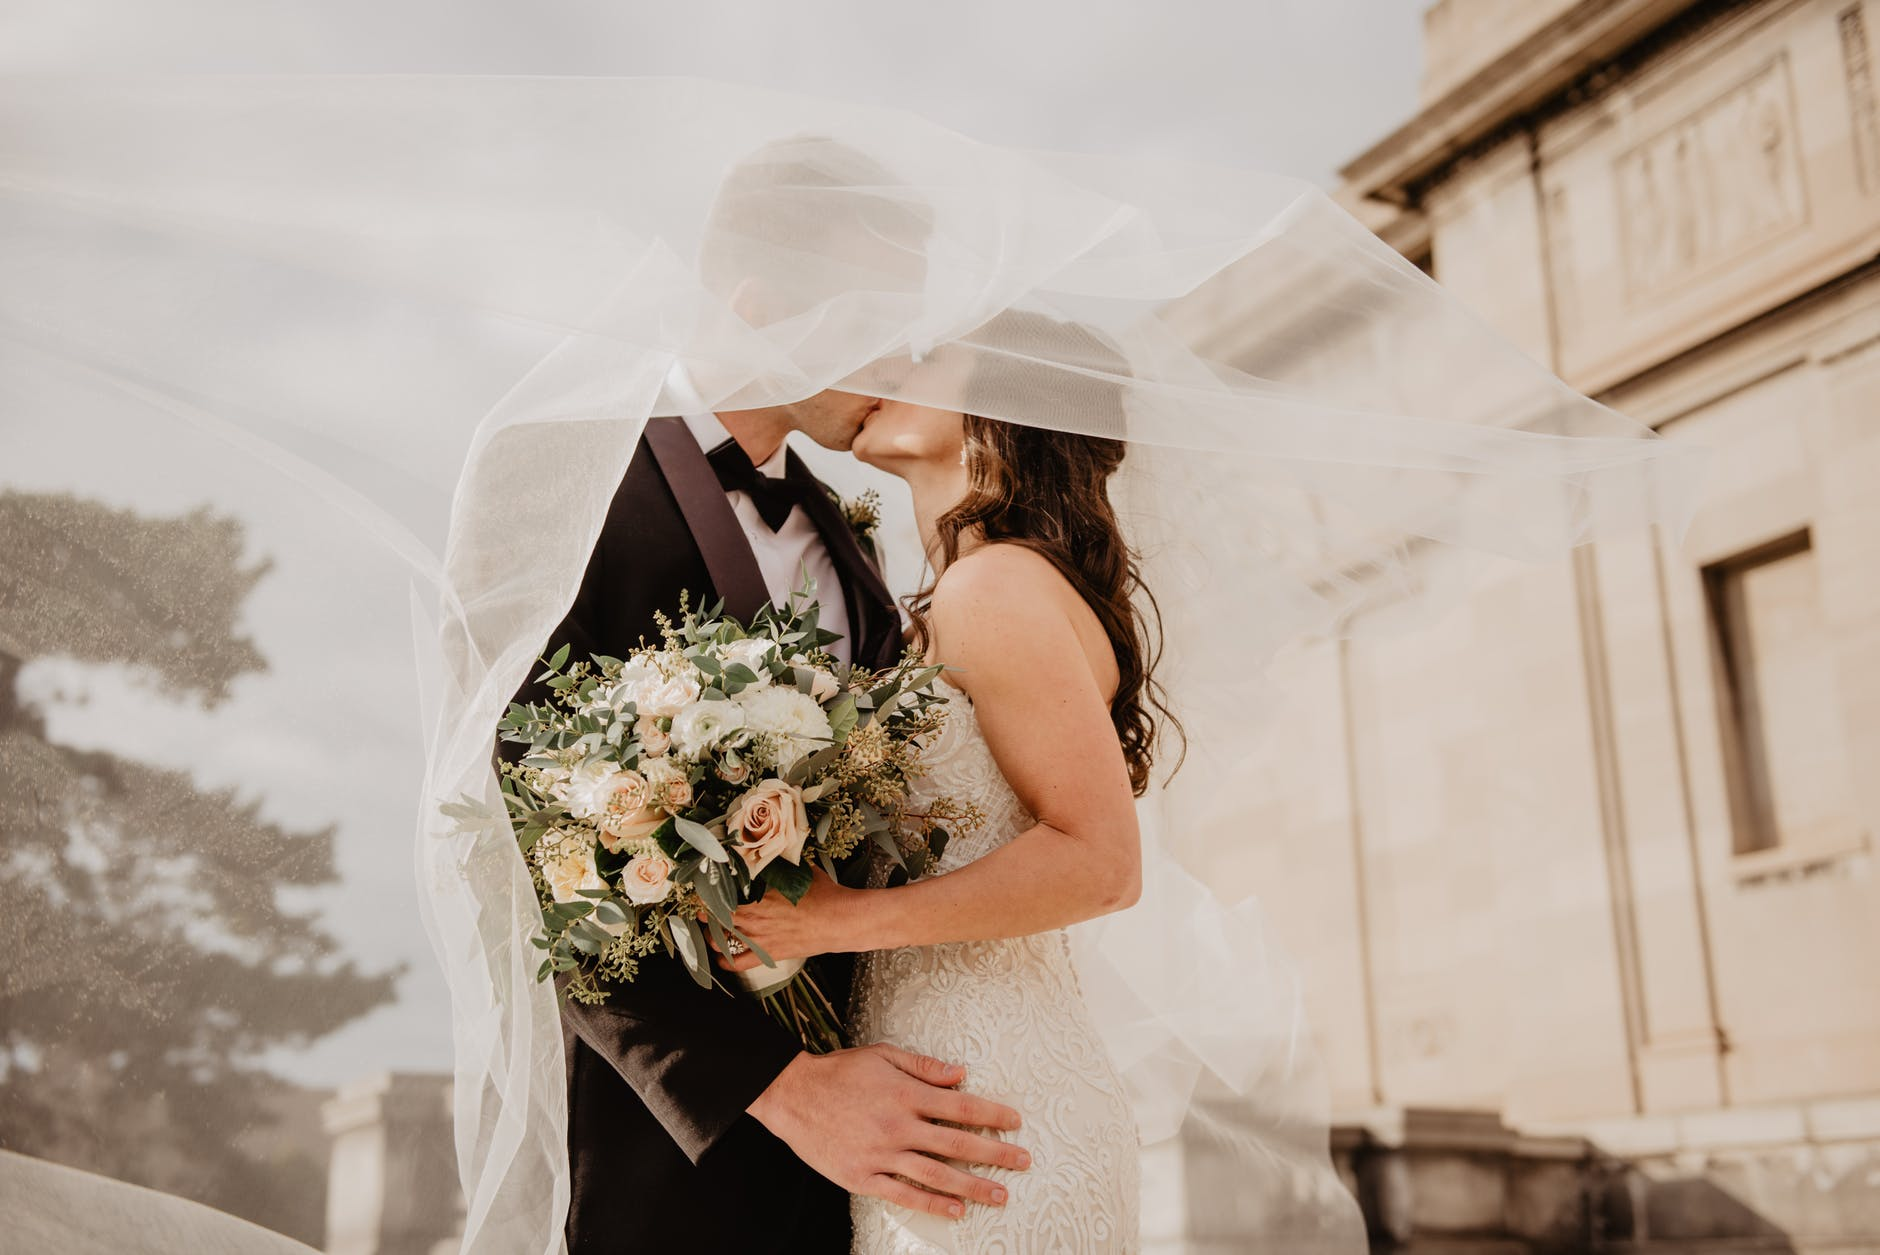 online Casual incontri iHookUp Cherry Dating Schweiz